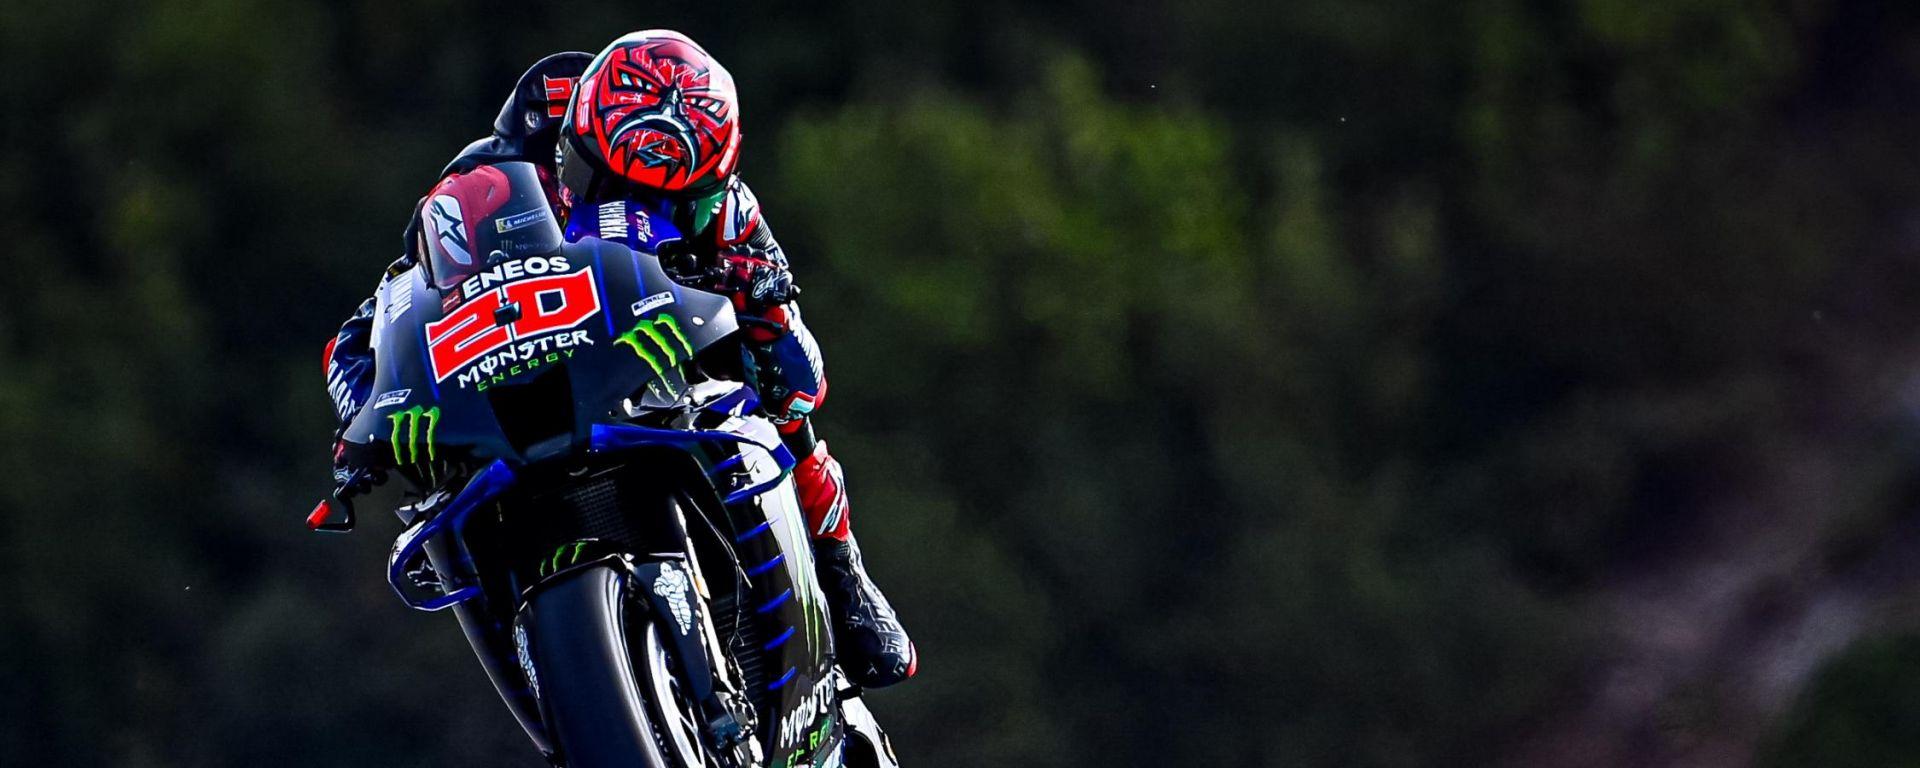 MotoGP Spagna 2021, Jerez - Fabio Quartararo (Yamaha)